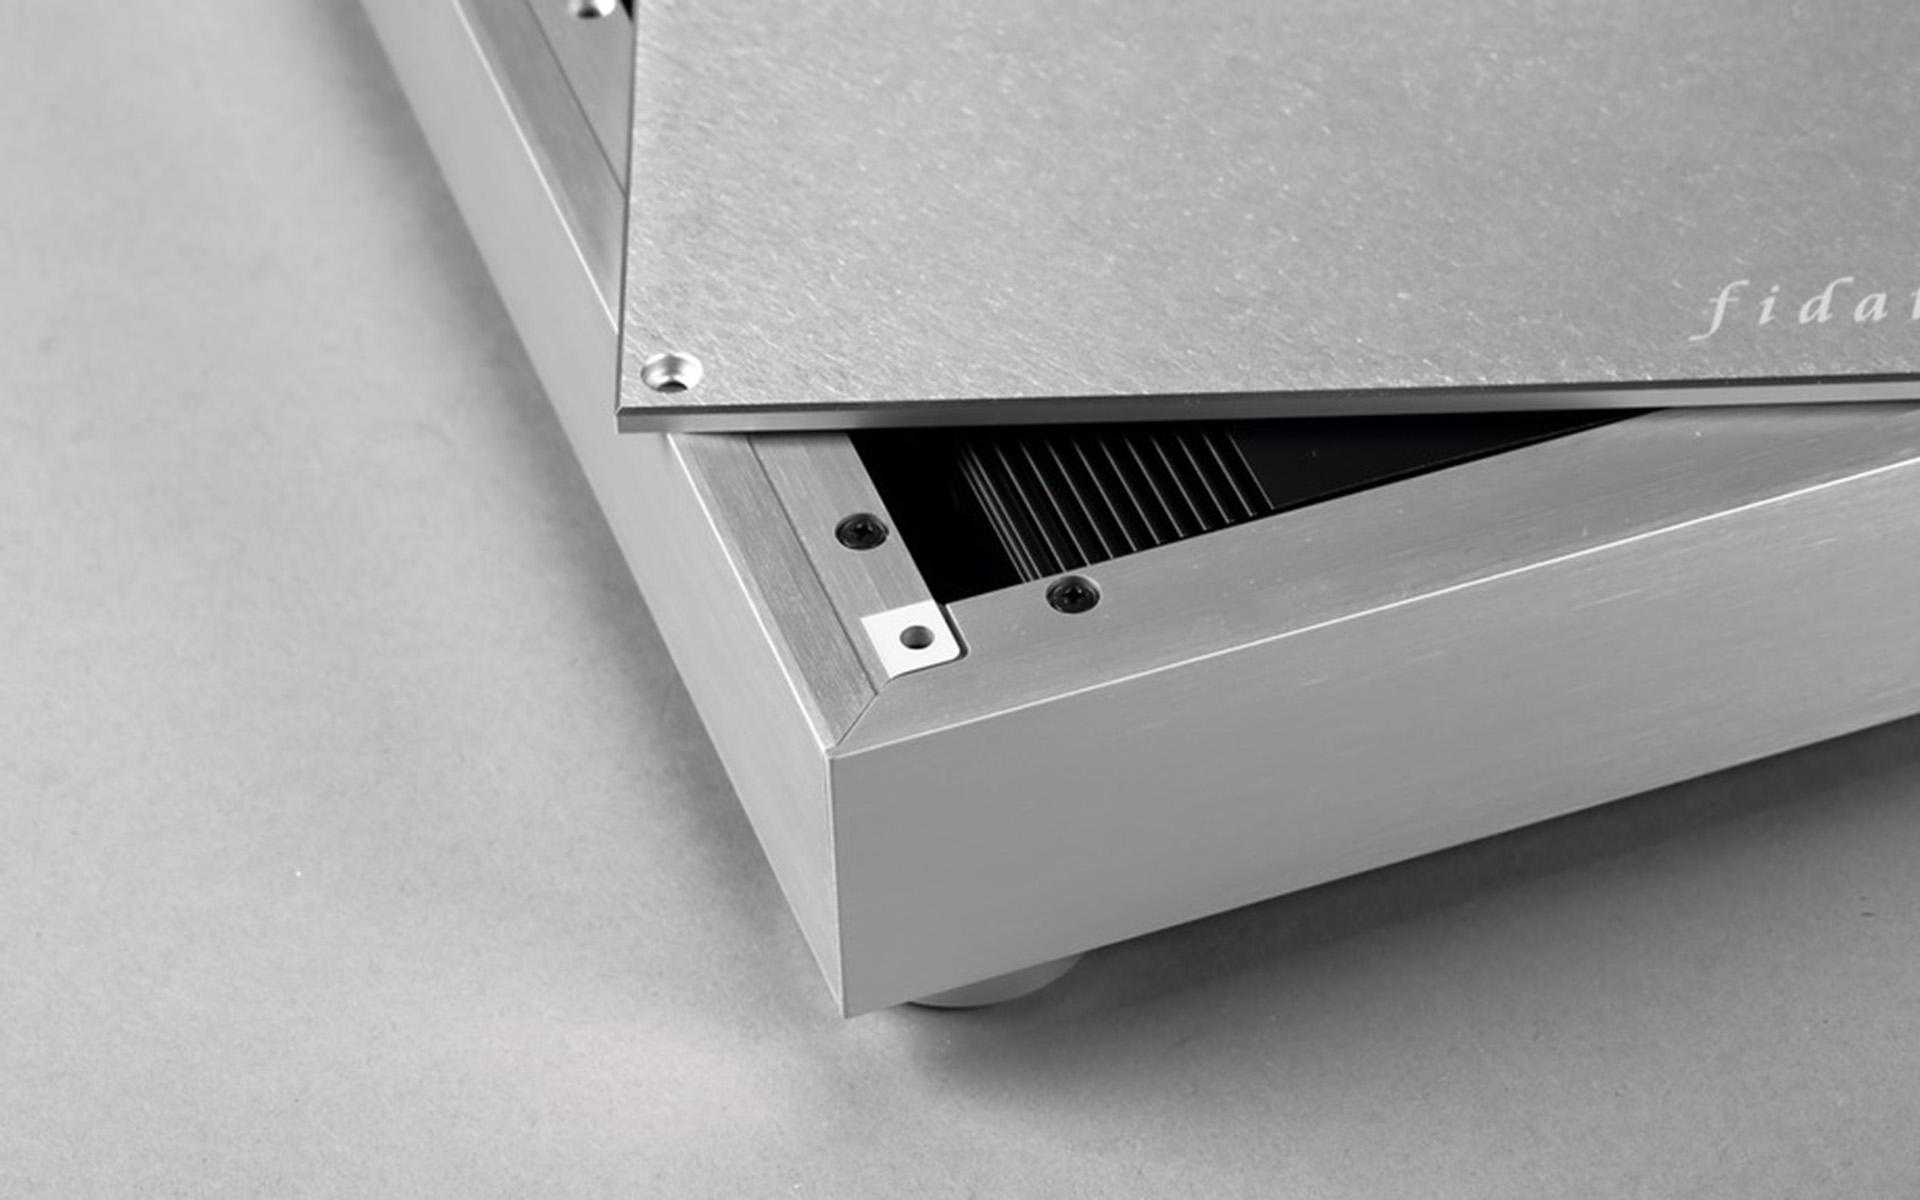 Аудиосервер класса High End HFAS1-XS20U